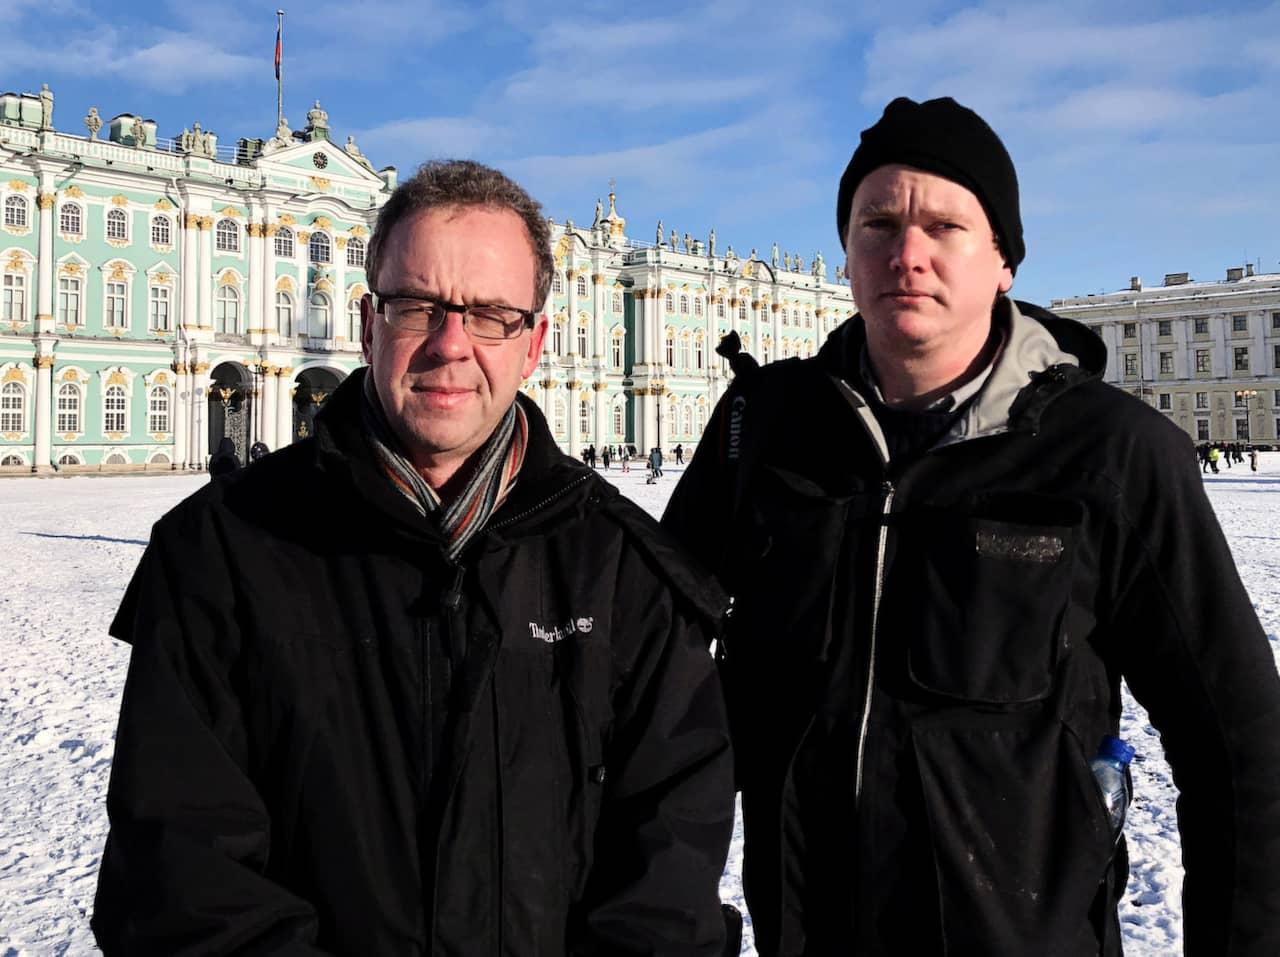 Mats Larsson & Axel Öberg